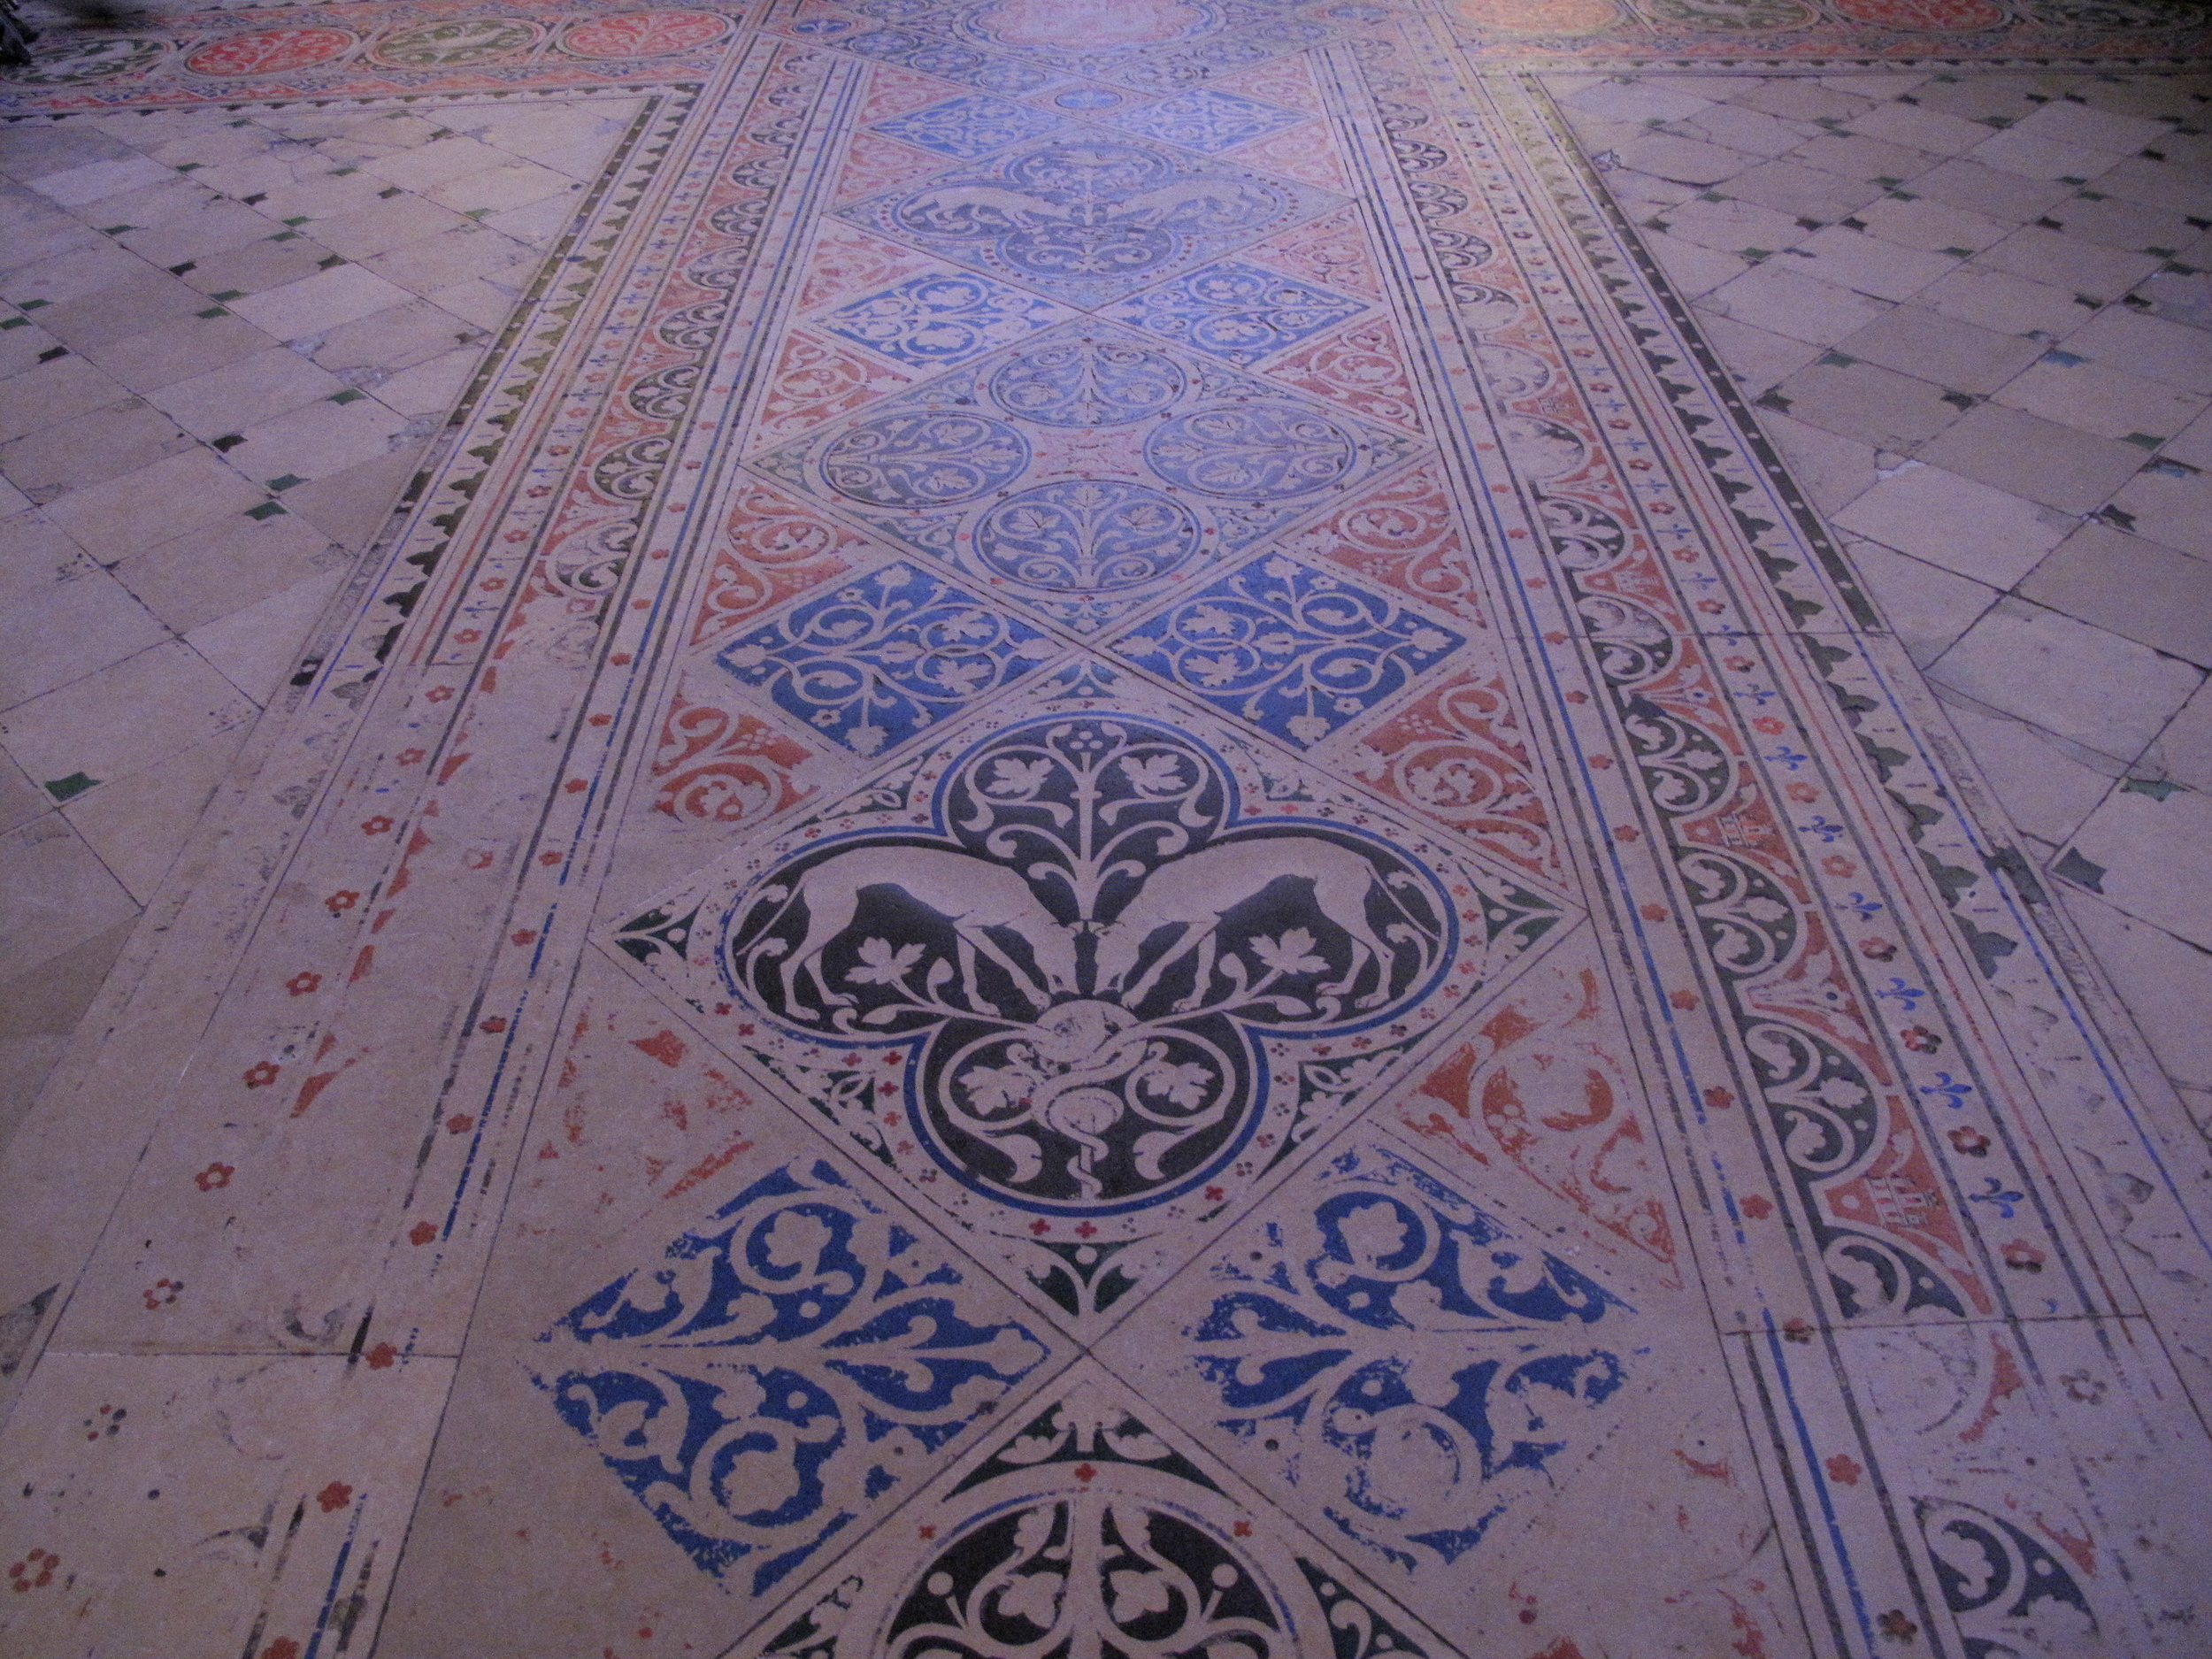 The floor tiles of Sainte Chapelle